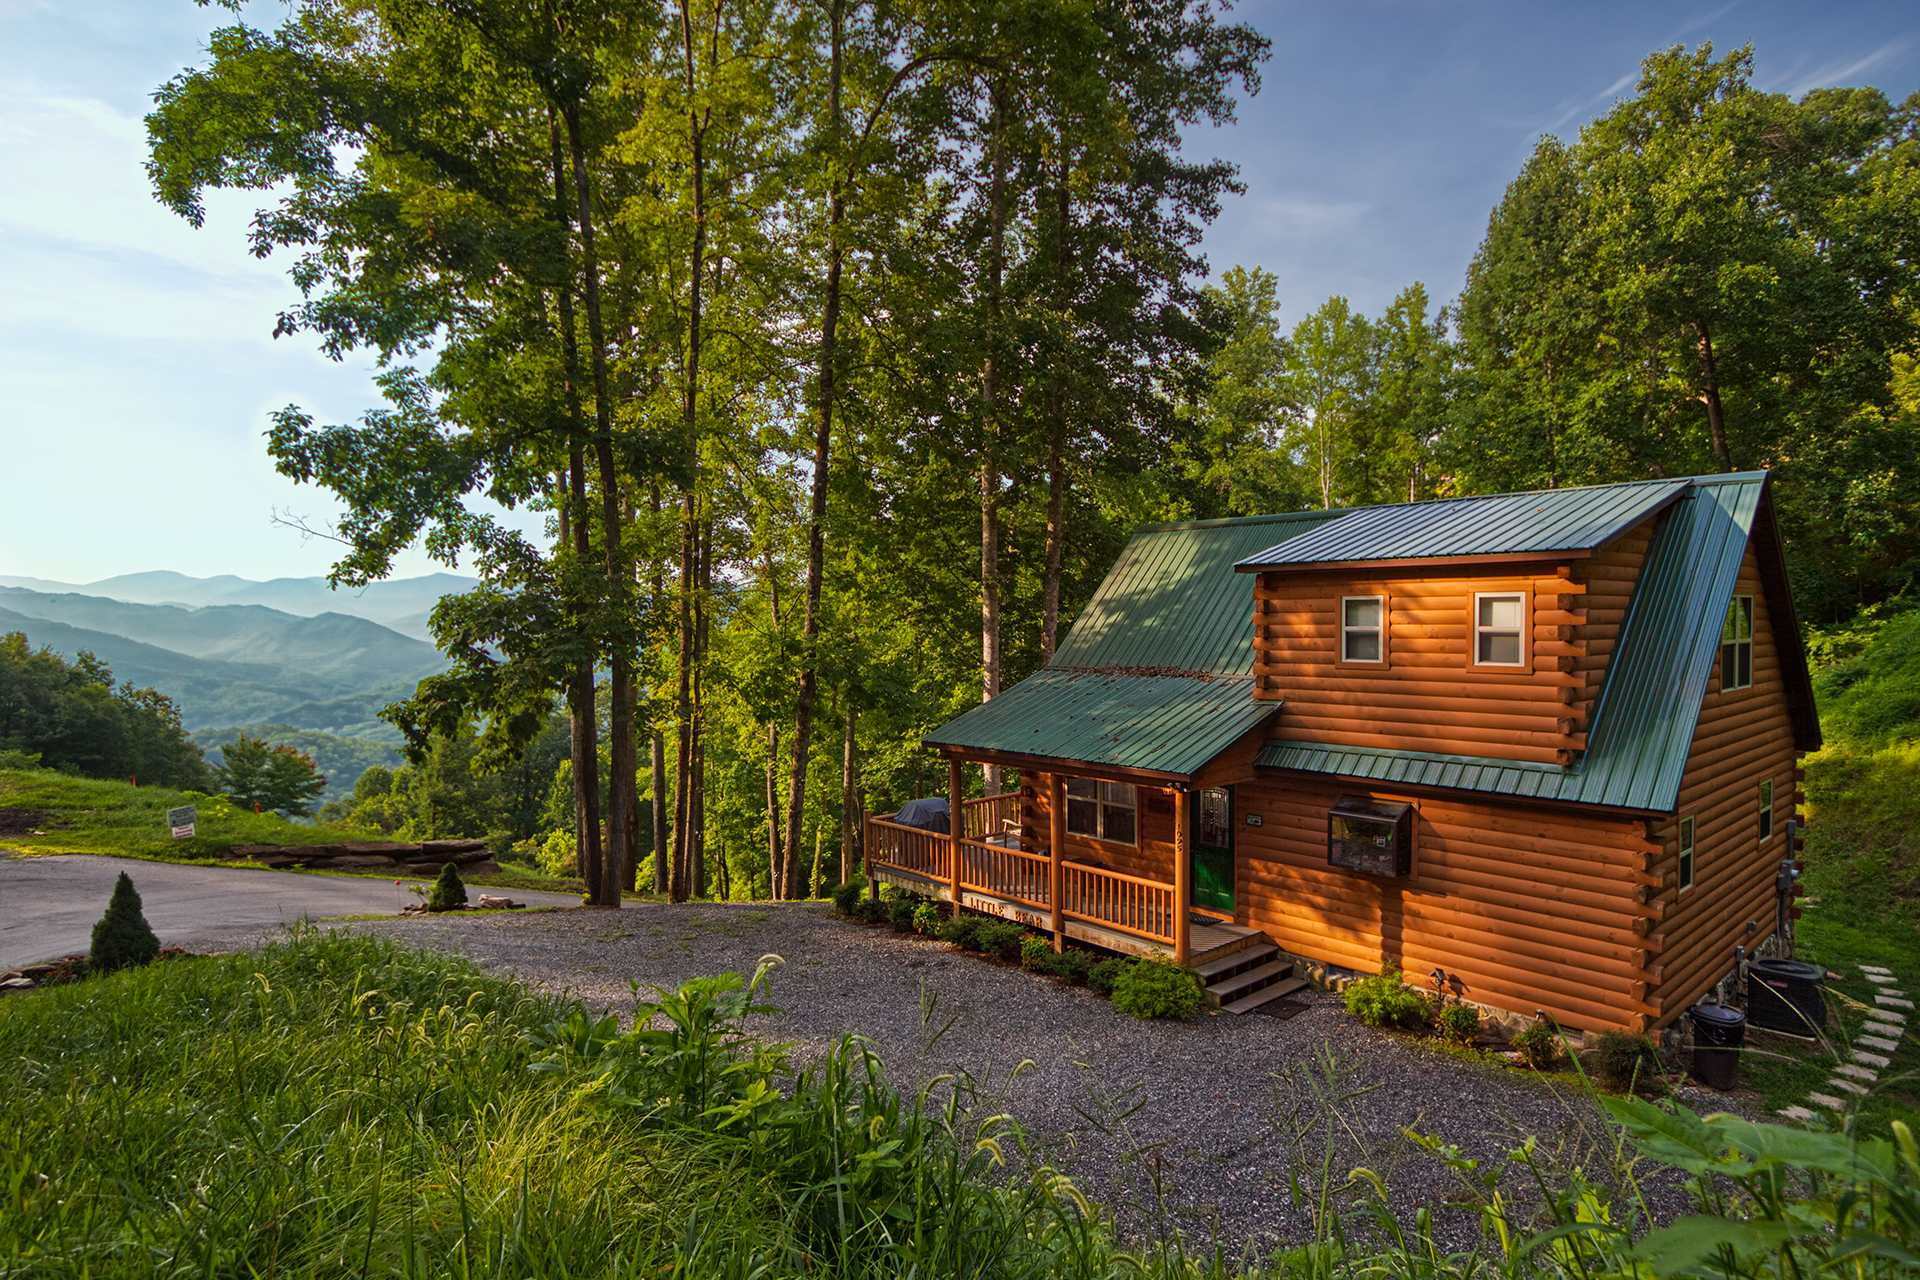 Little bear chalet nc log cabin rental with mountain views for Little bear cabin in gatlinburg tn